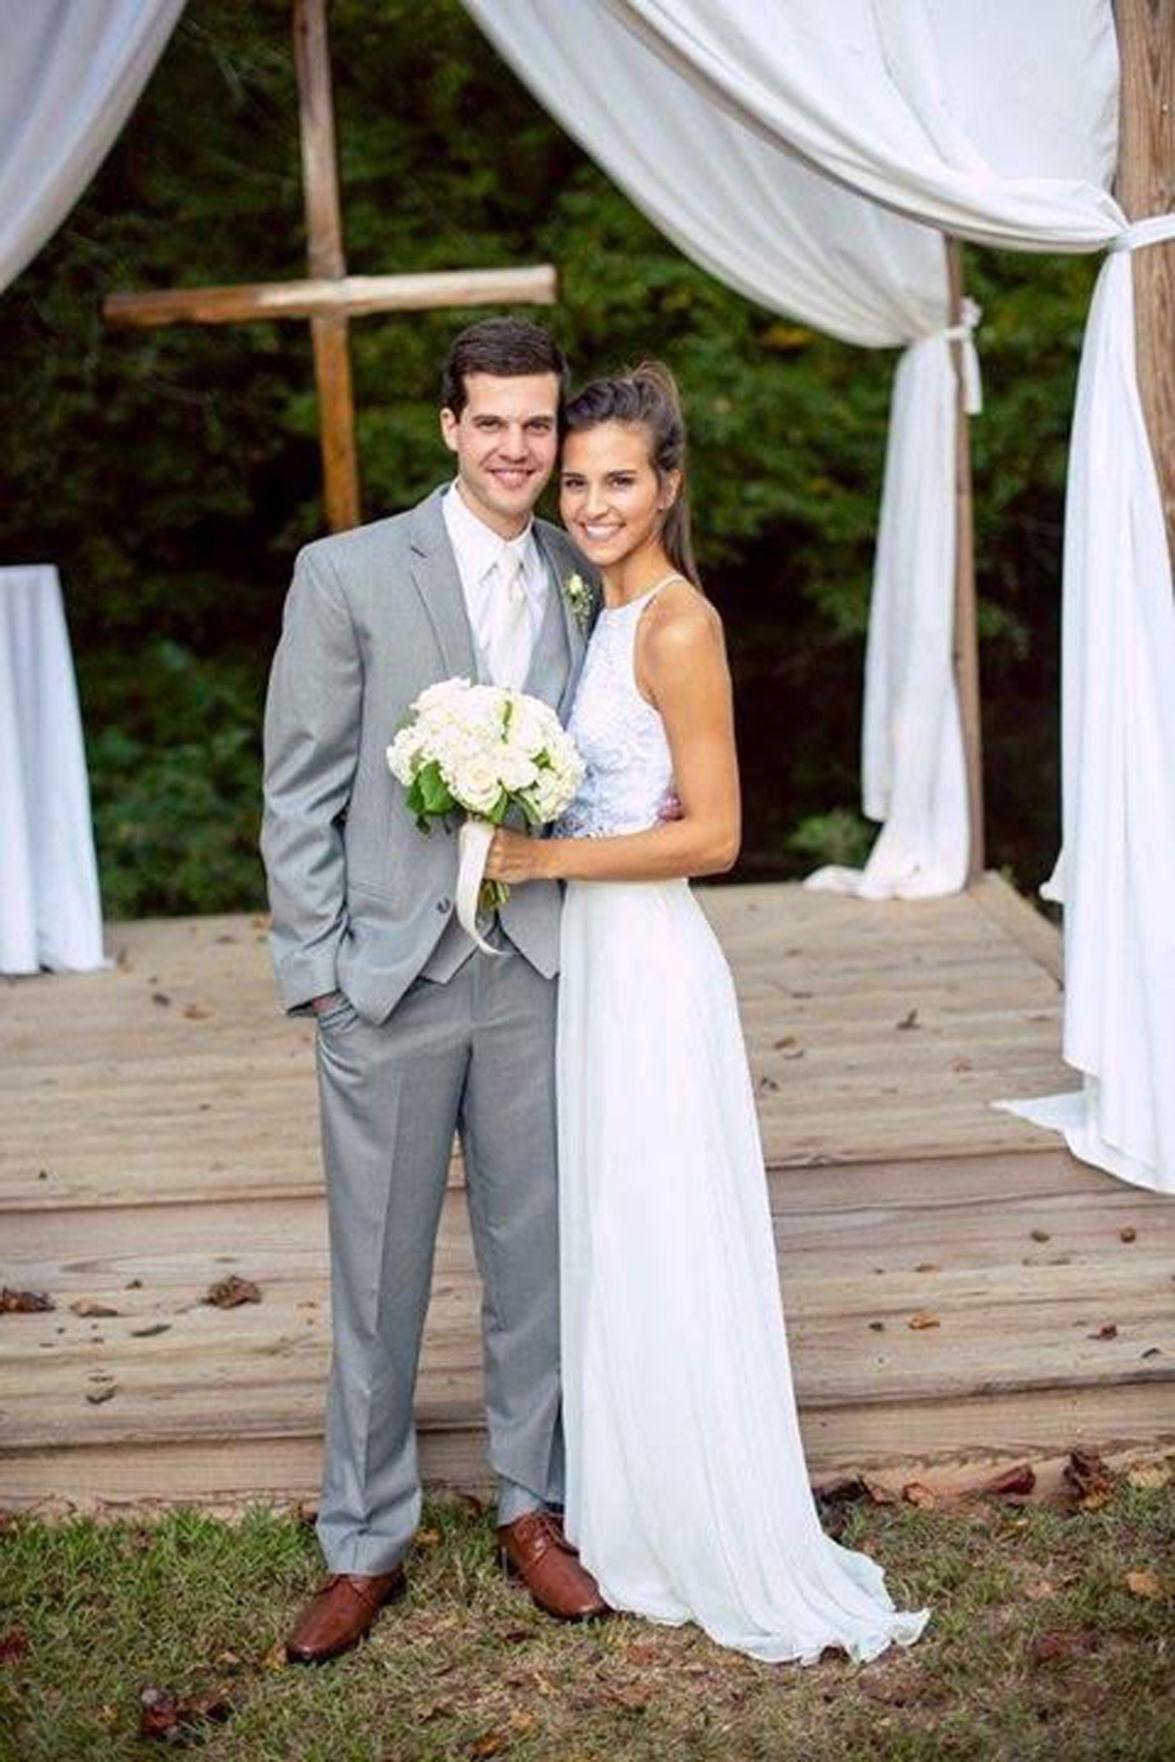 Mr. and Mrs. William David Matthews